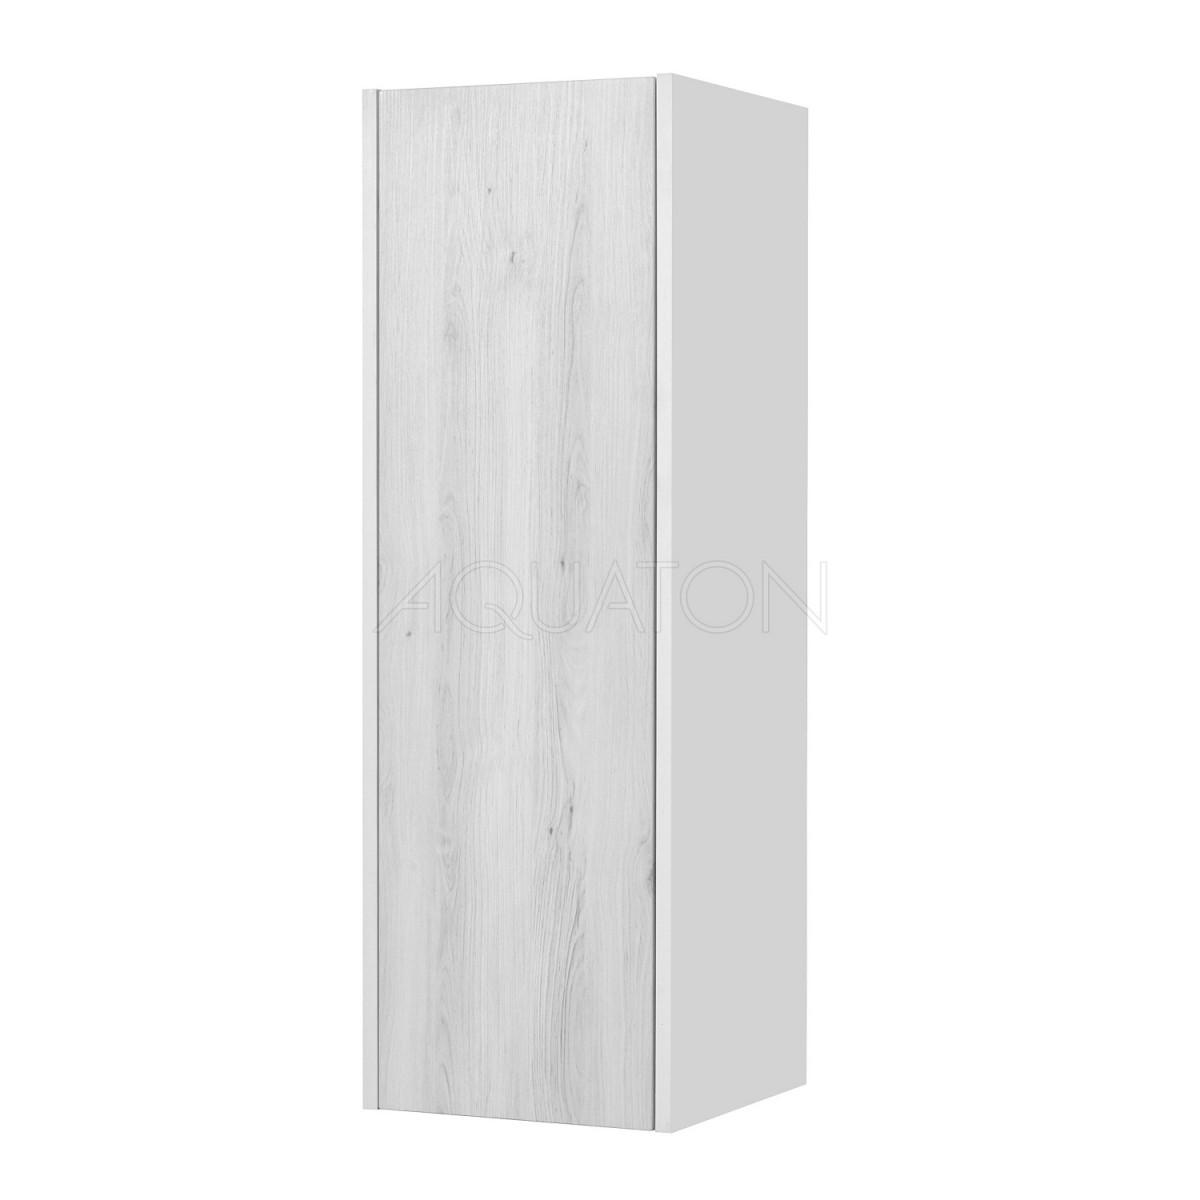 Шкафчик подвесной Акватон Сакура левый